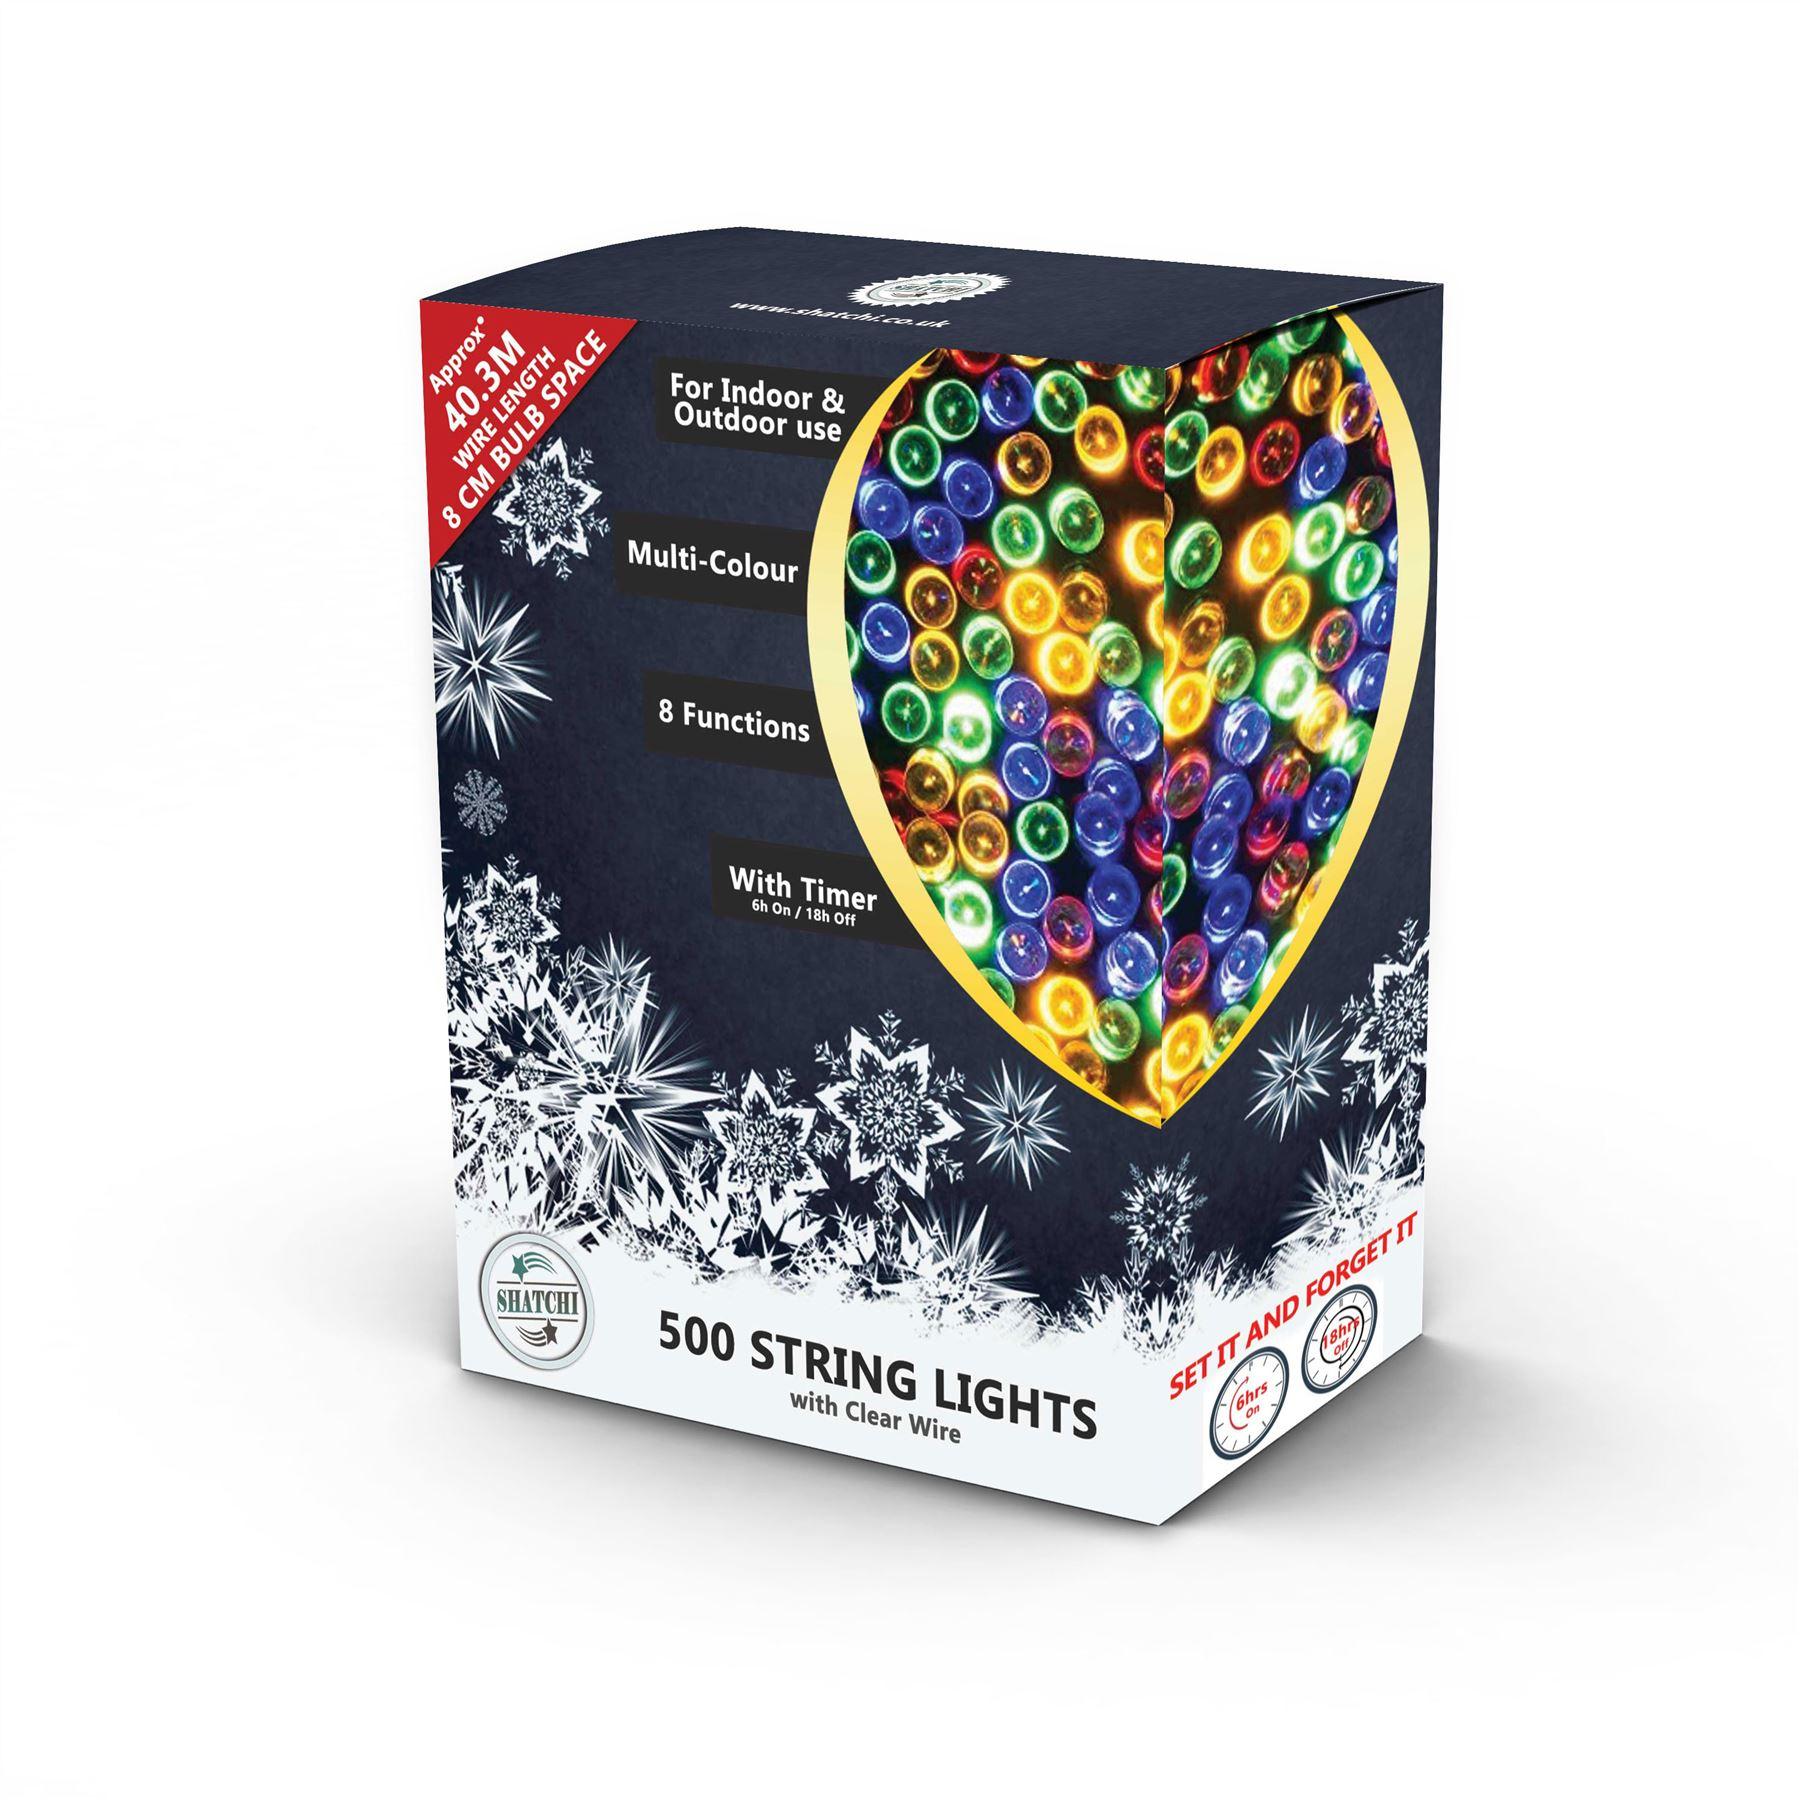 100-200-300-400-500-LED-Christmas-String-Fairy-Lights-Xmas-Decorations-Tree miniature 35